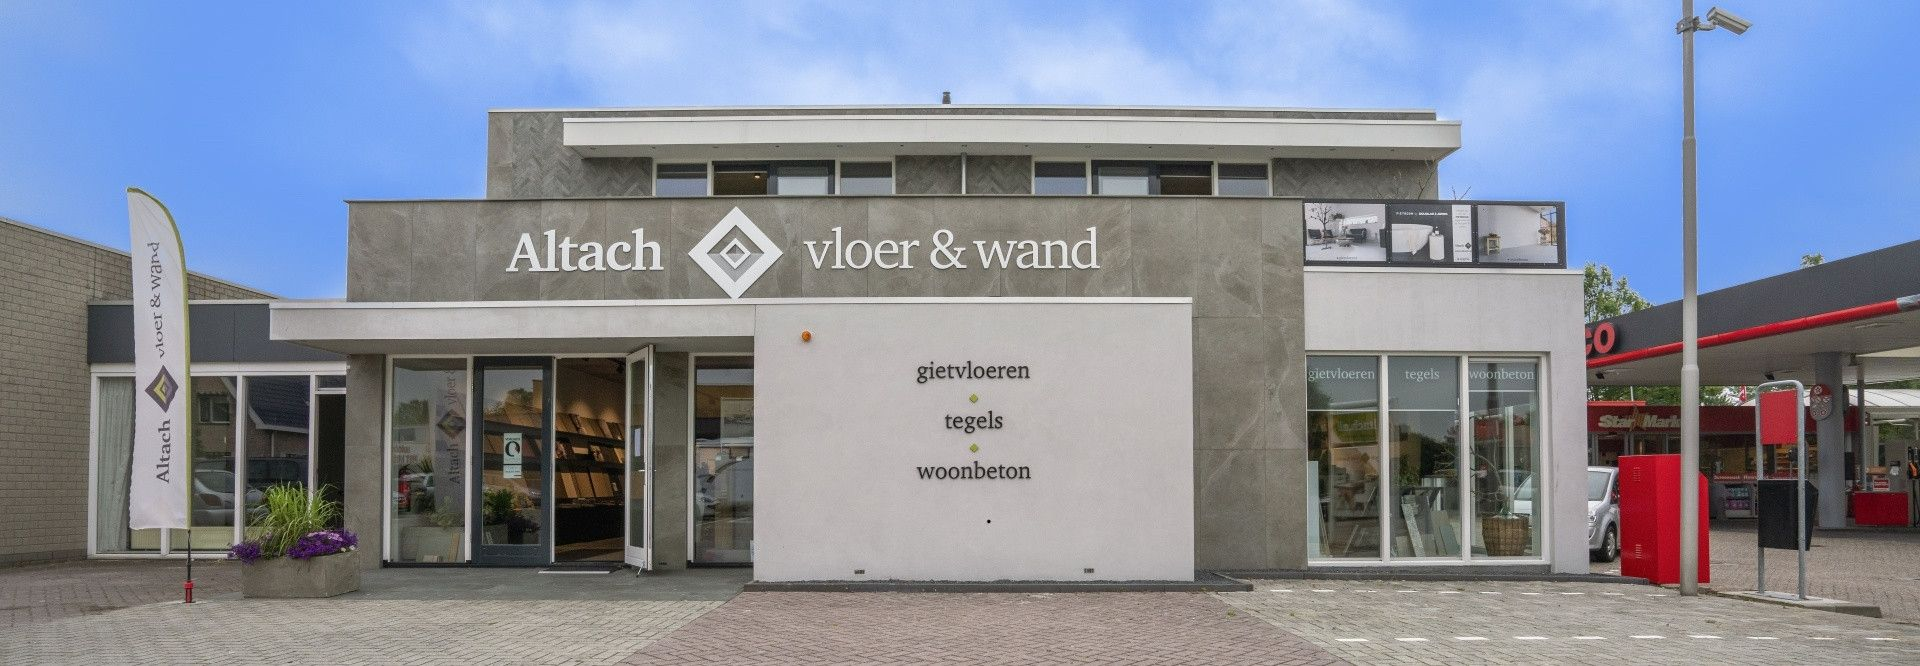 Altach showroom Dirkshorn